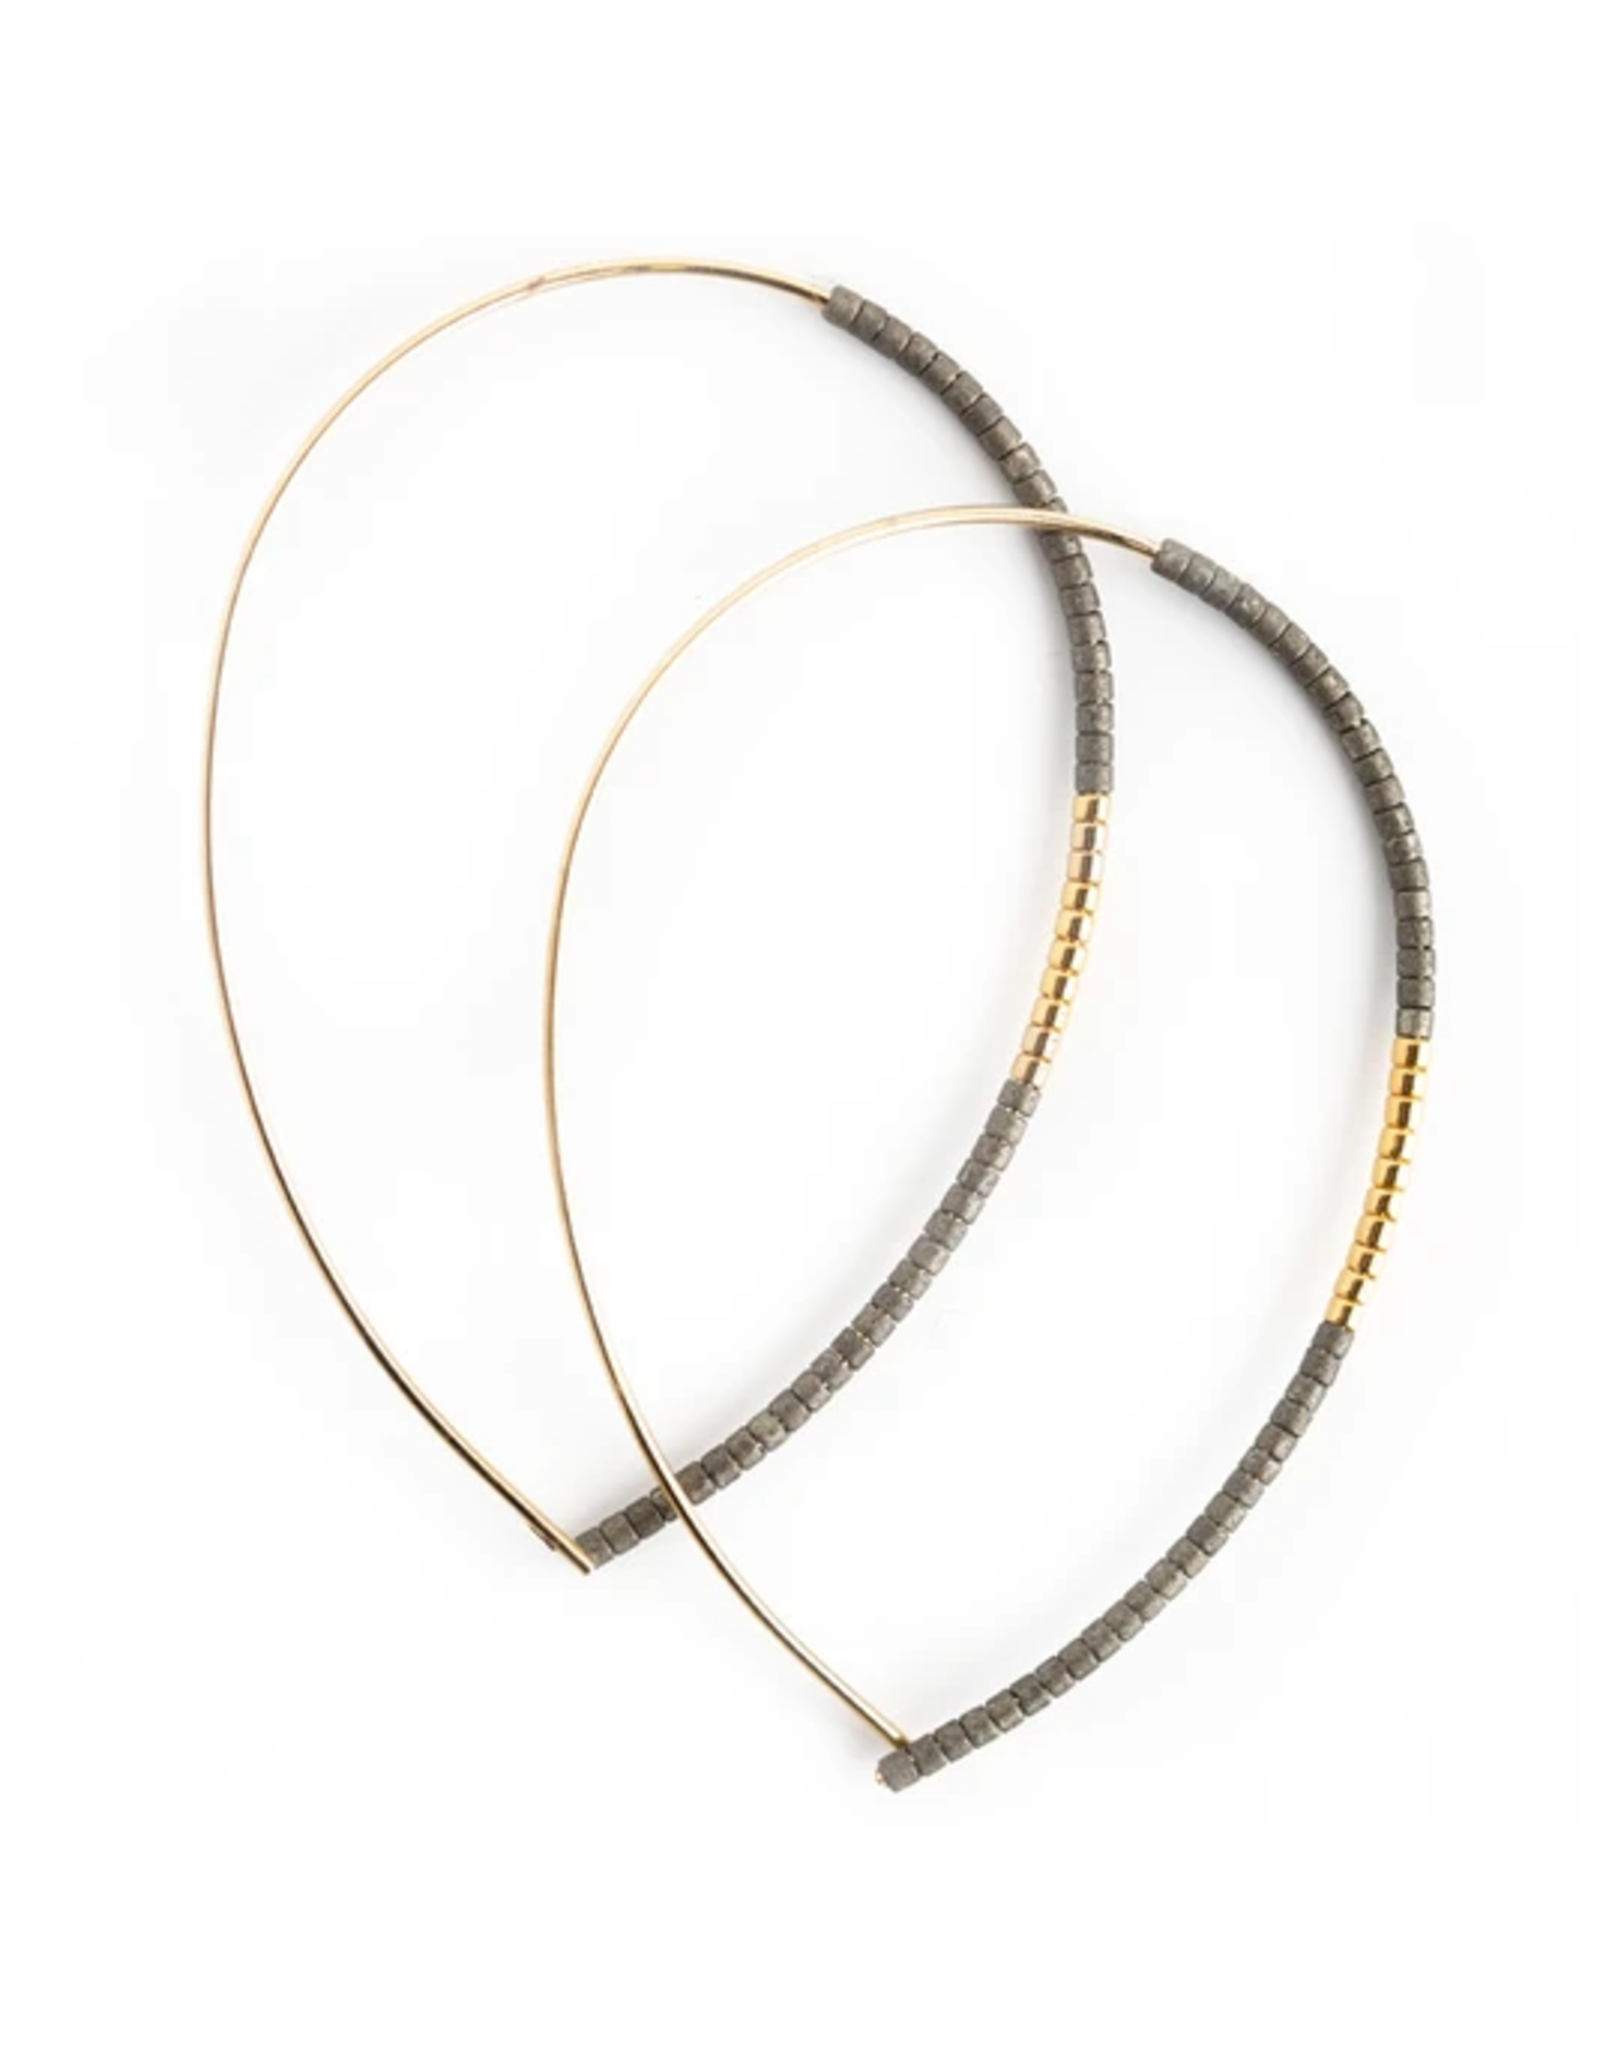 L&E Norah Earrings, matte graphite gold